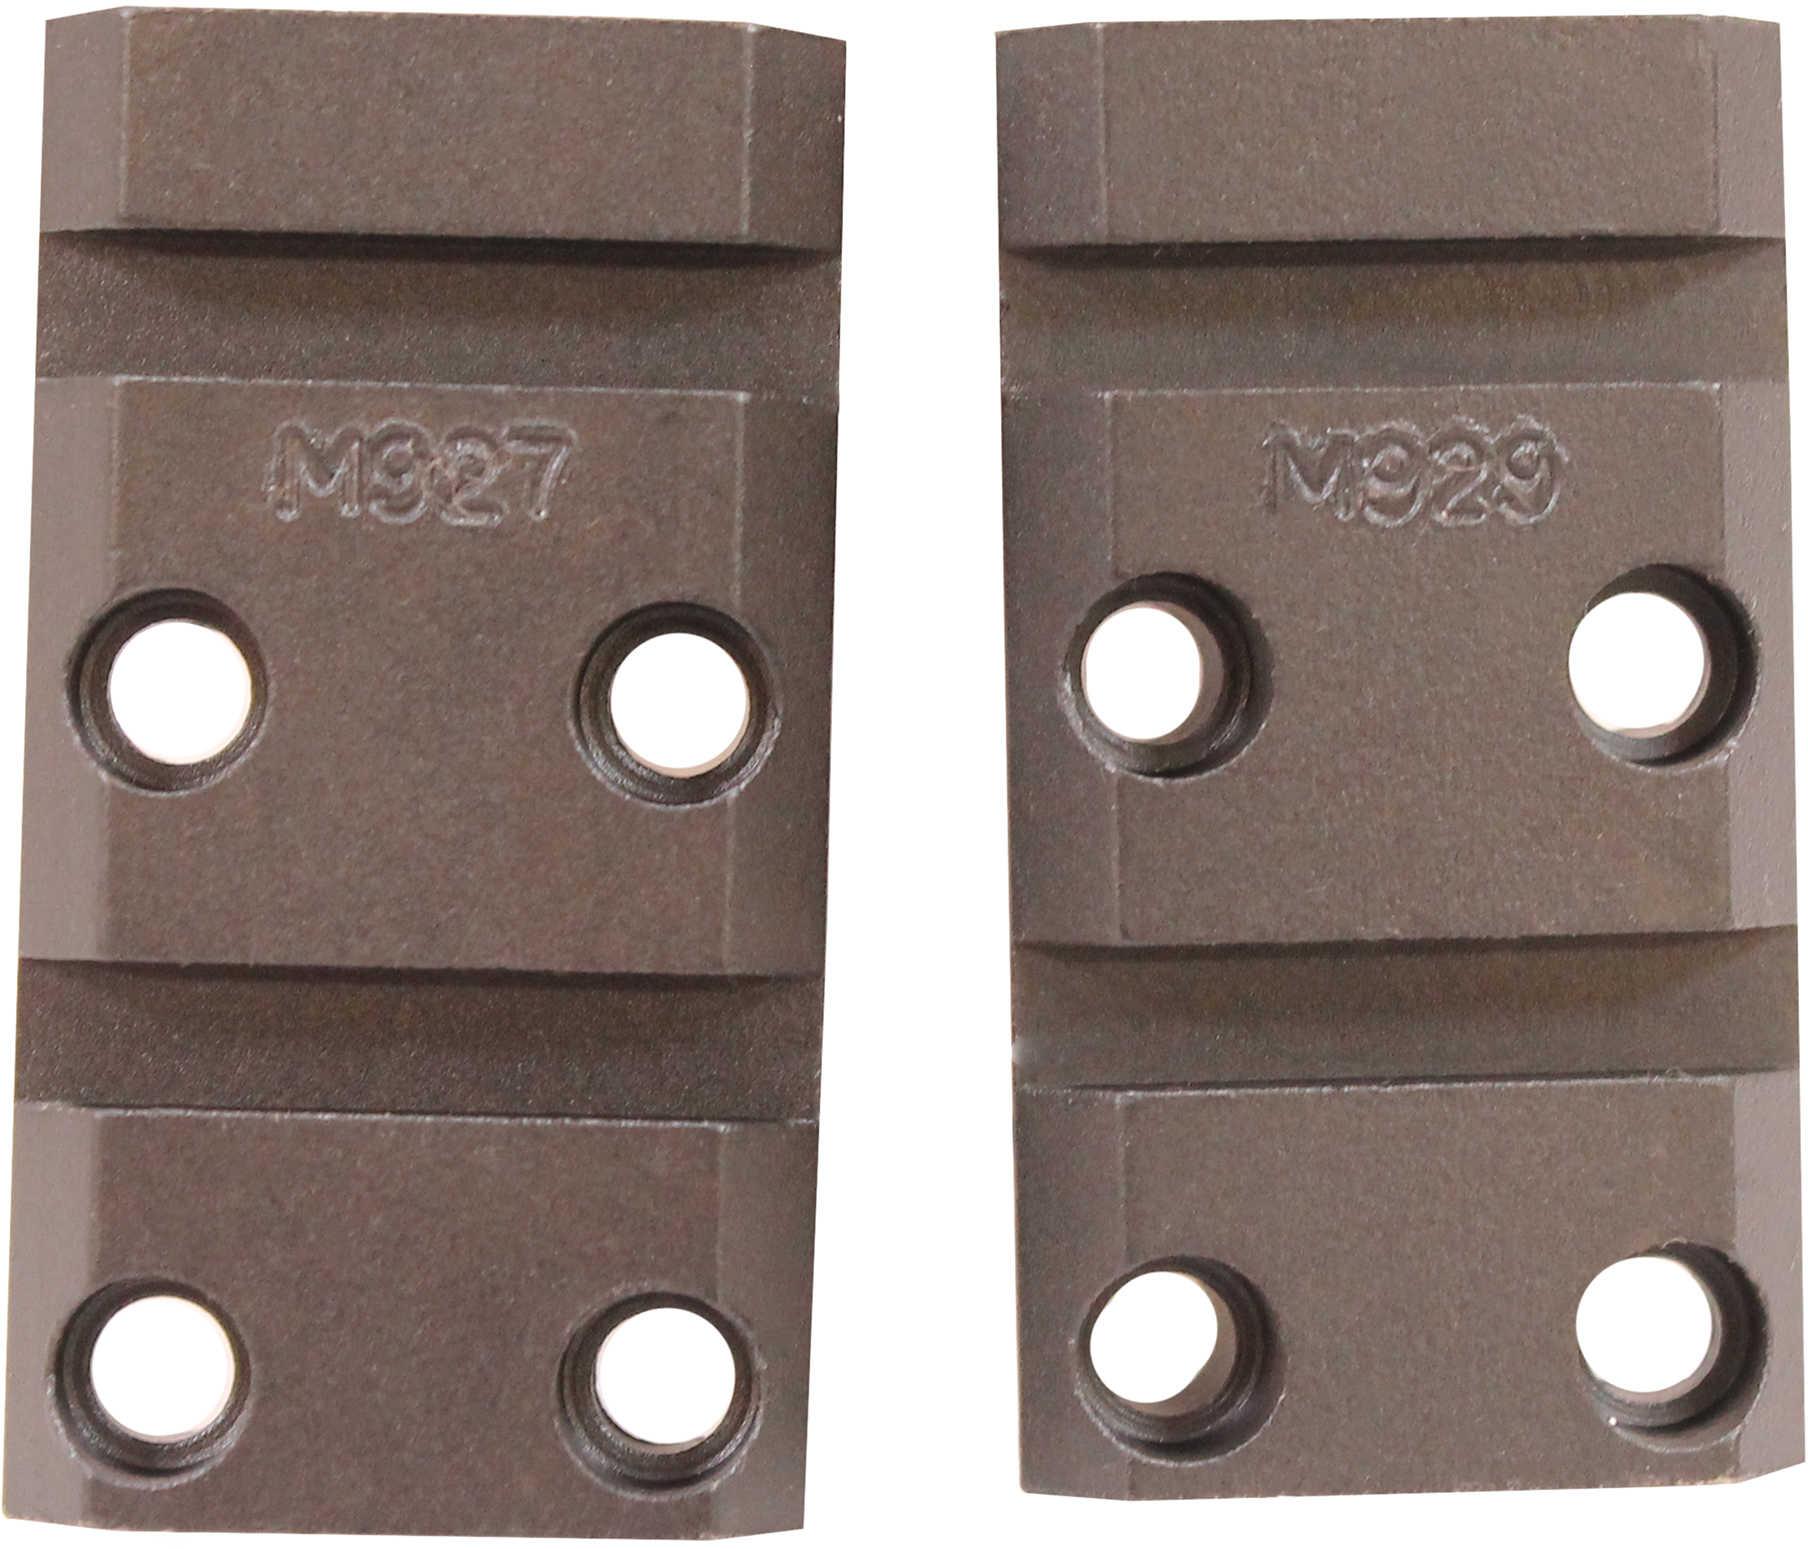 Warne Scope Mounts Maxima 2 Piece Base Fits Browning X-Bolt Matte Finish M927/929M